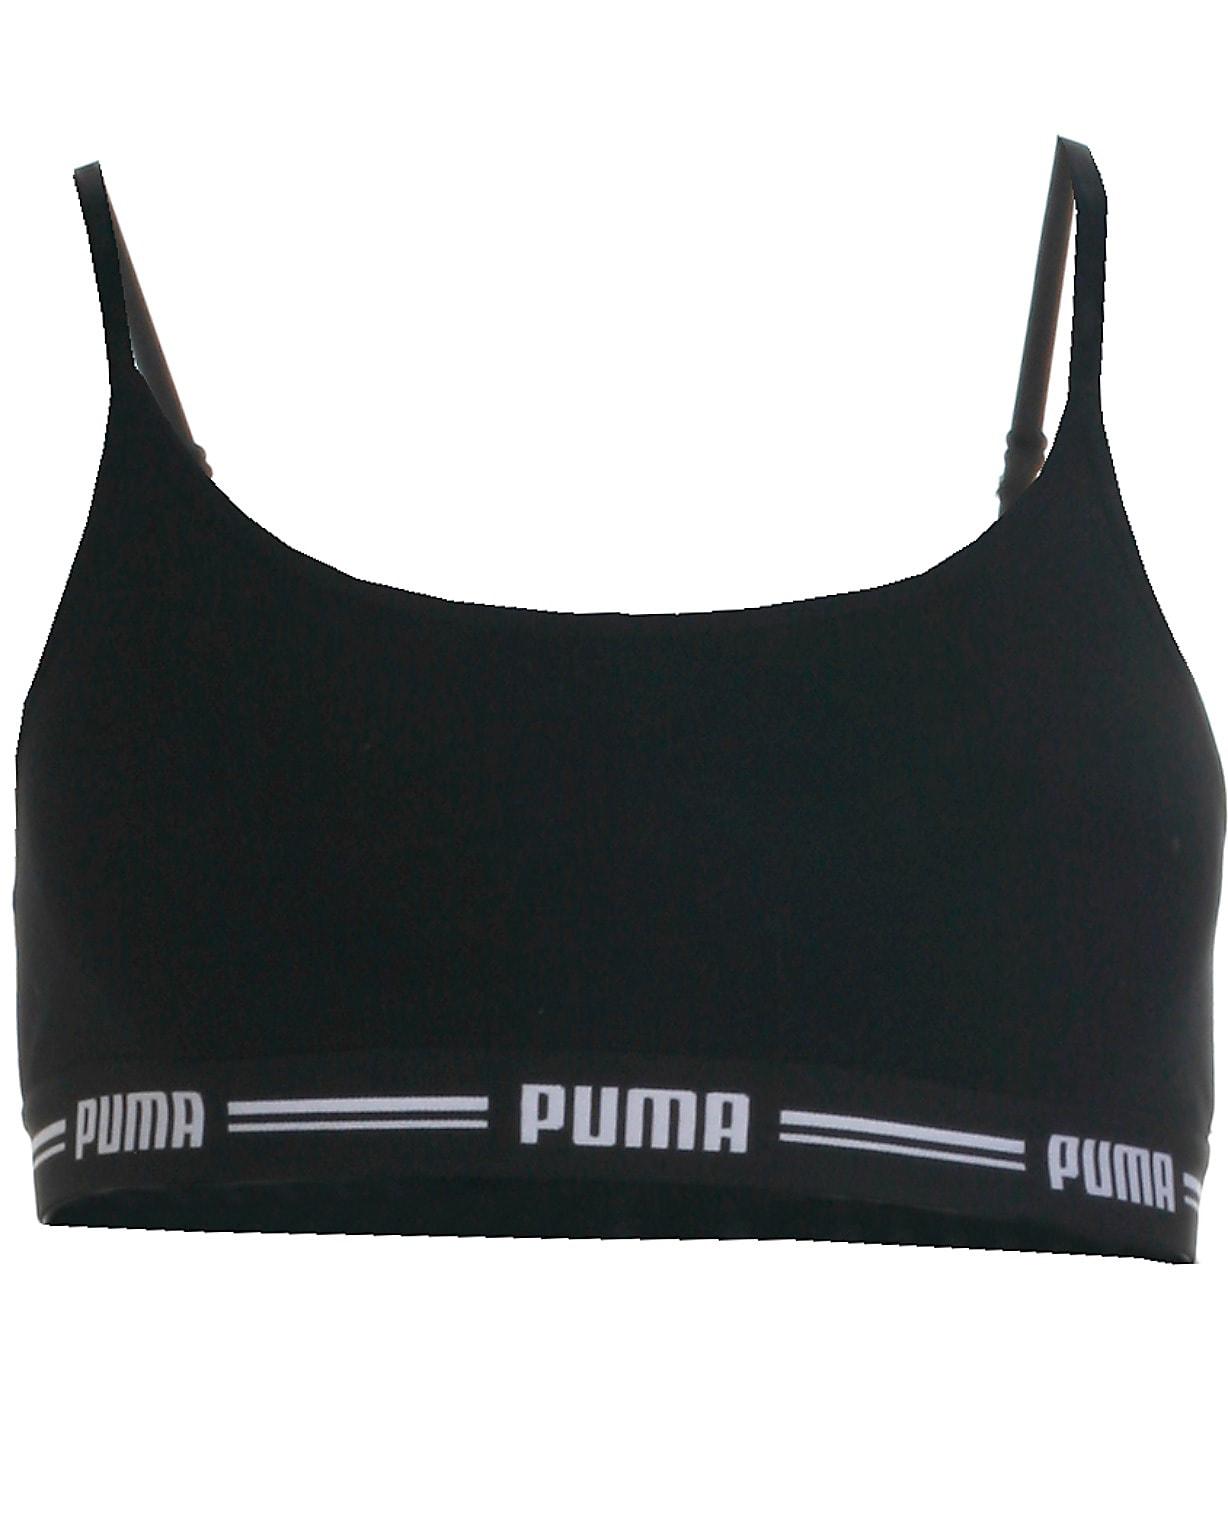 Image of Puma bralette, Casual, sort